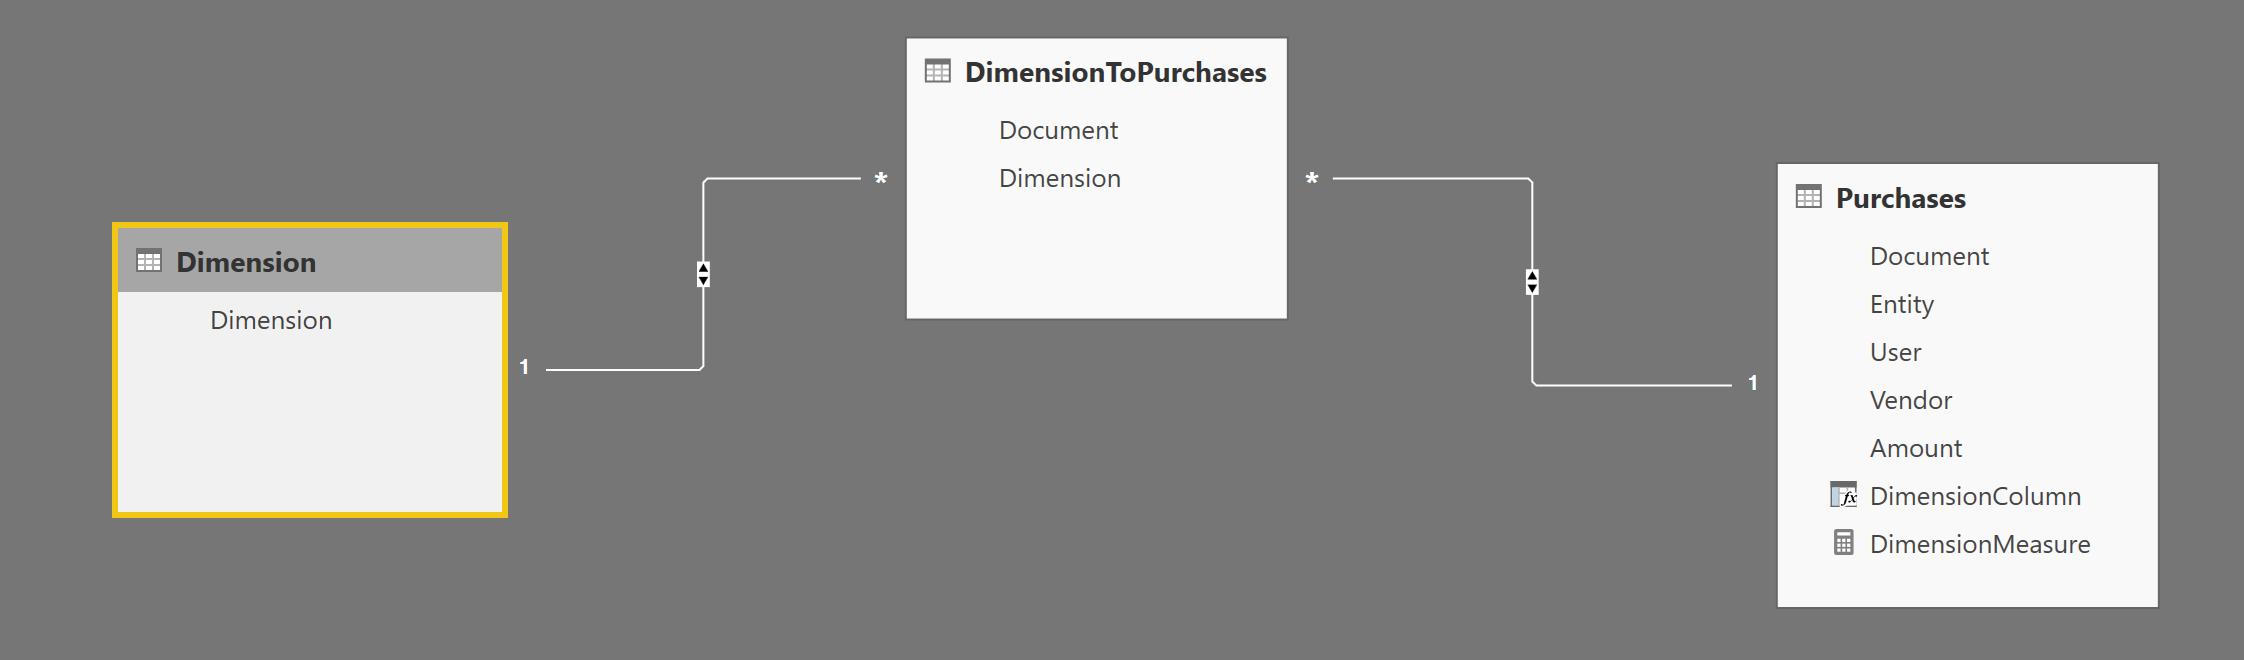 Dynamic dimensions in Power BI | LeanX